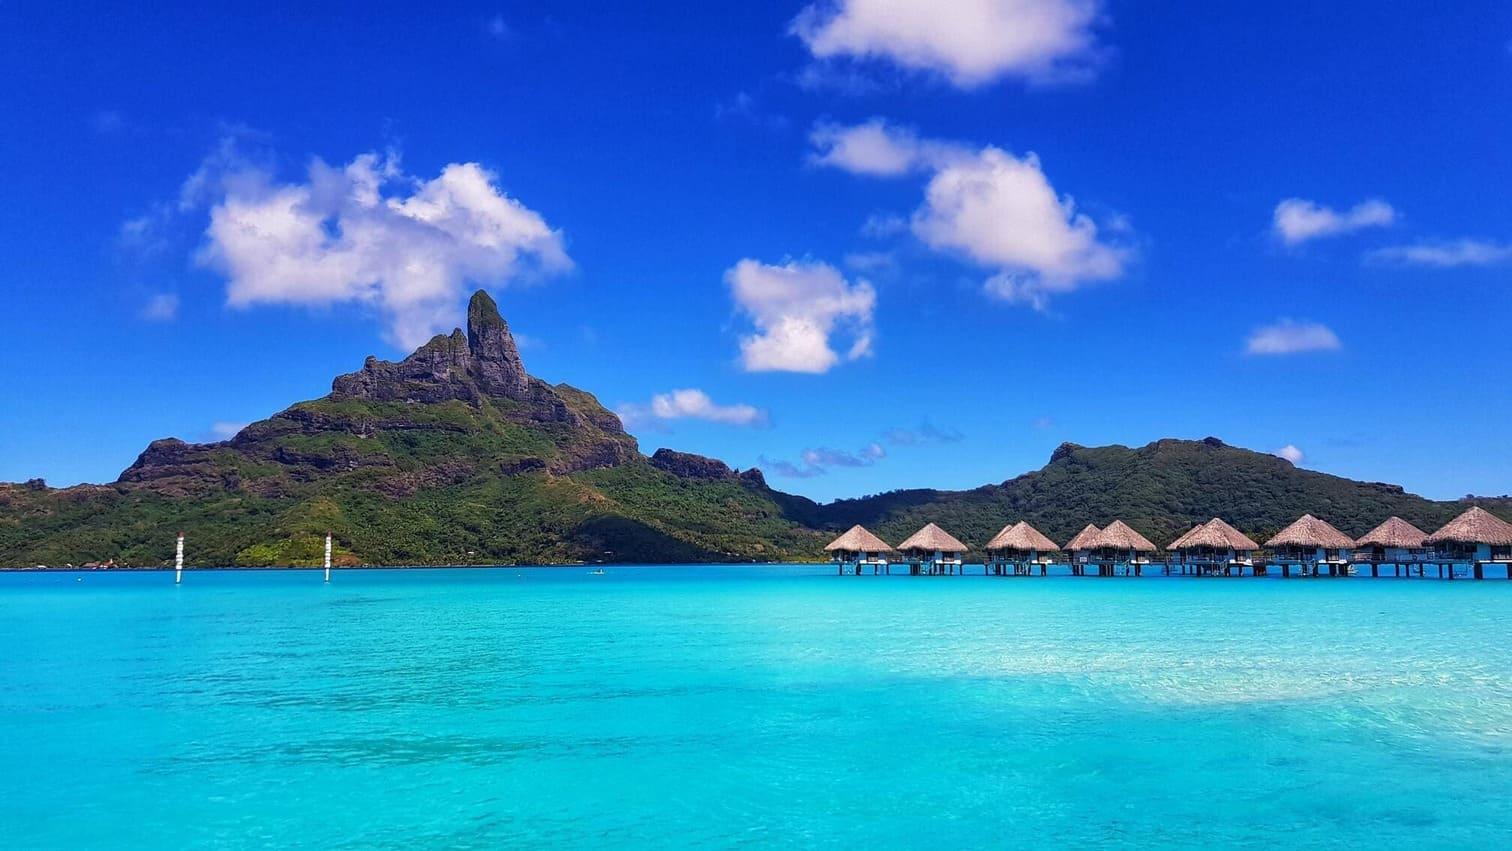 A view of the tropical island Bora Bora